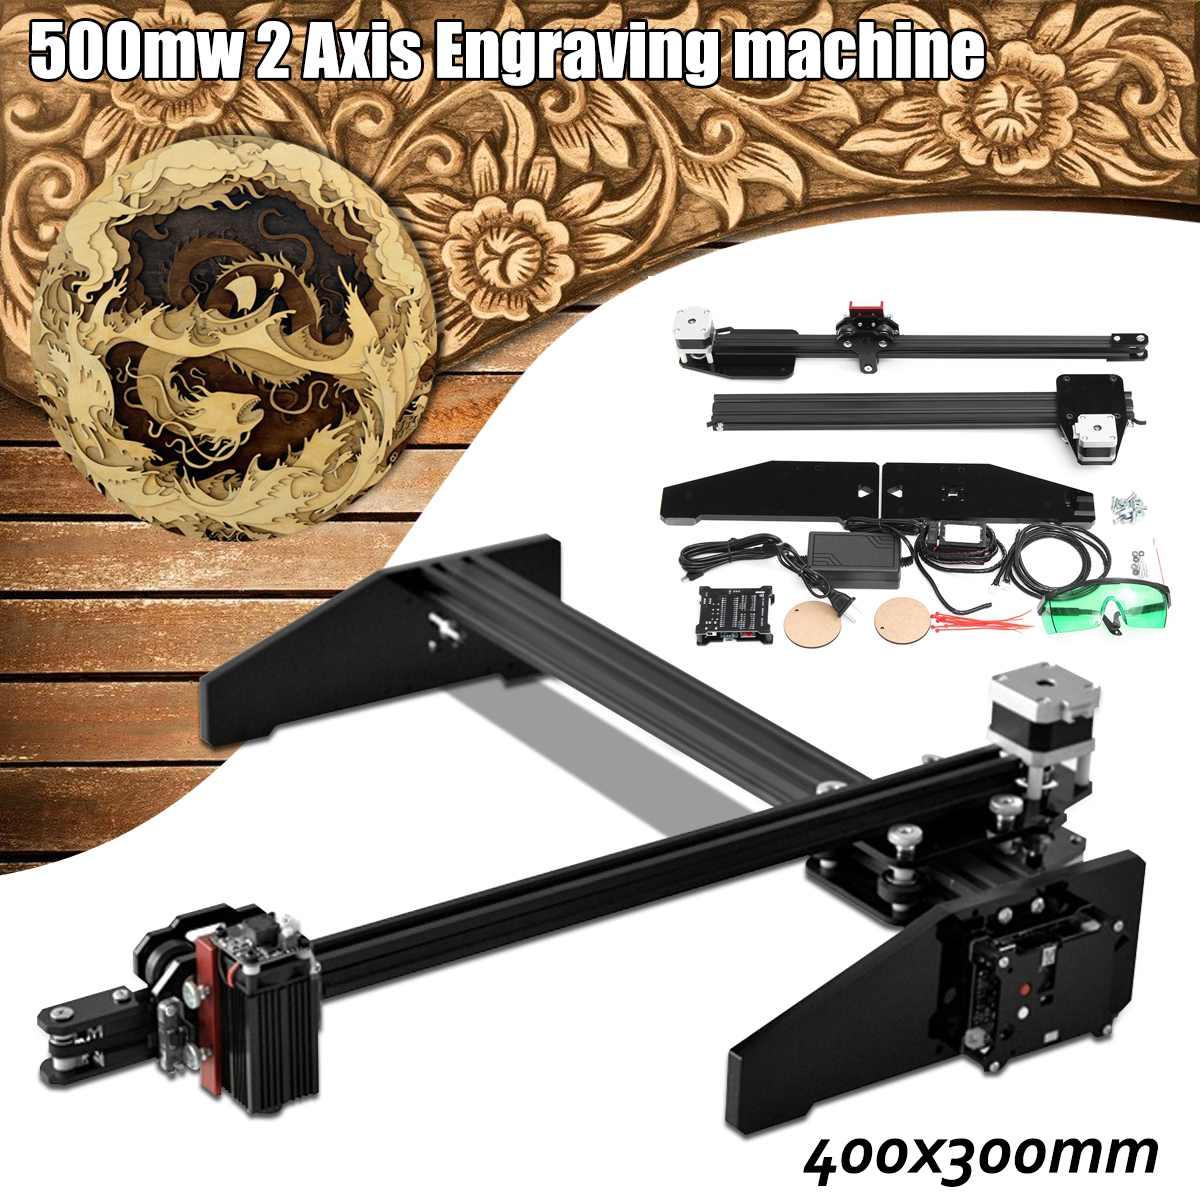 Newest 40*30cm 500mw 2Axis A3 Laser Engraving Cutting Engraver CNC Home DIY Cutter  Printer Using Stepper Motor Machine Tool